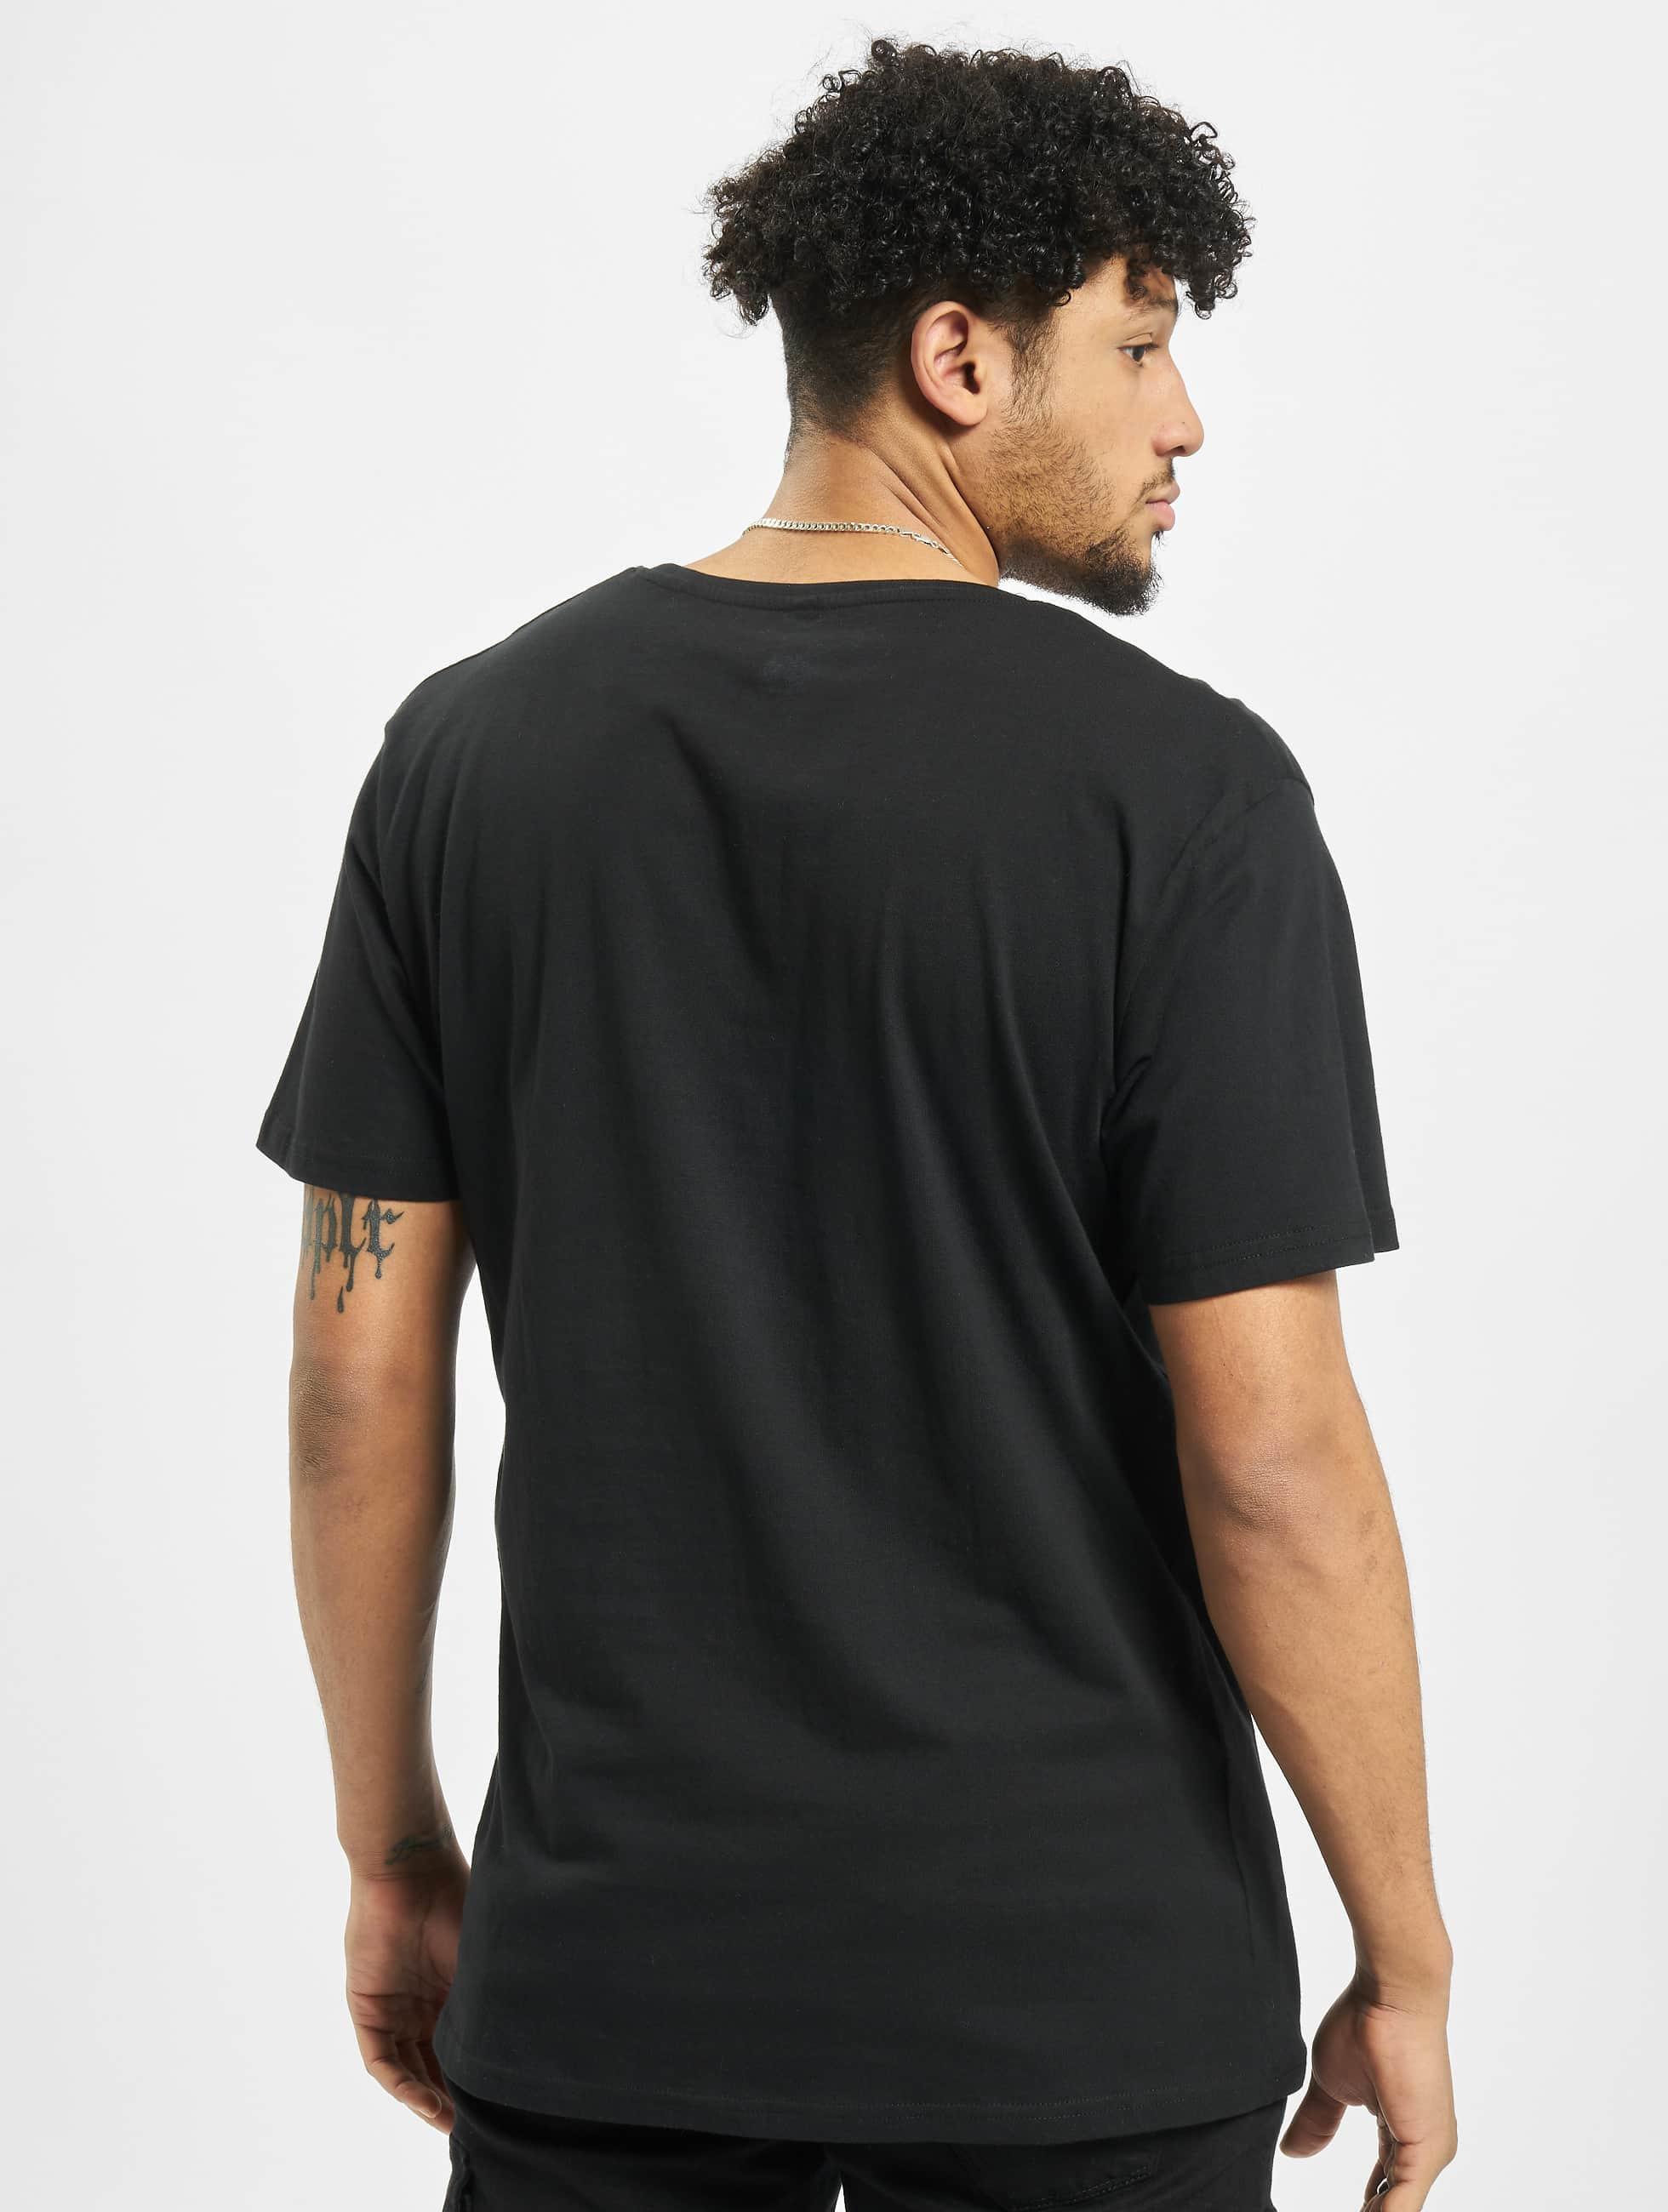 Mister Tee T-Shirt Bob Marley Lion black